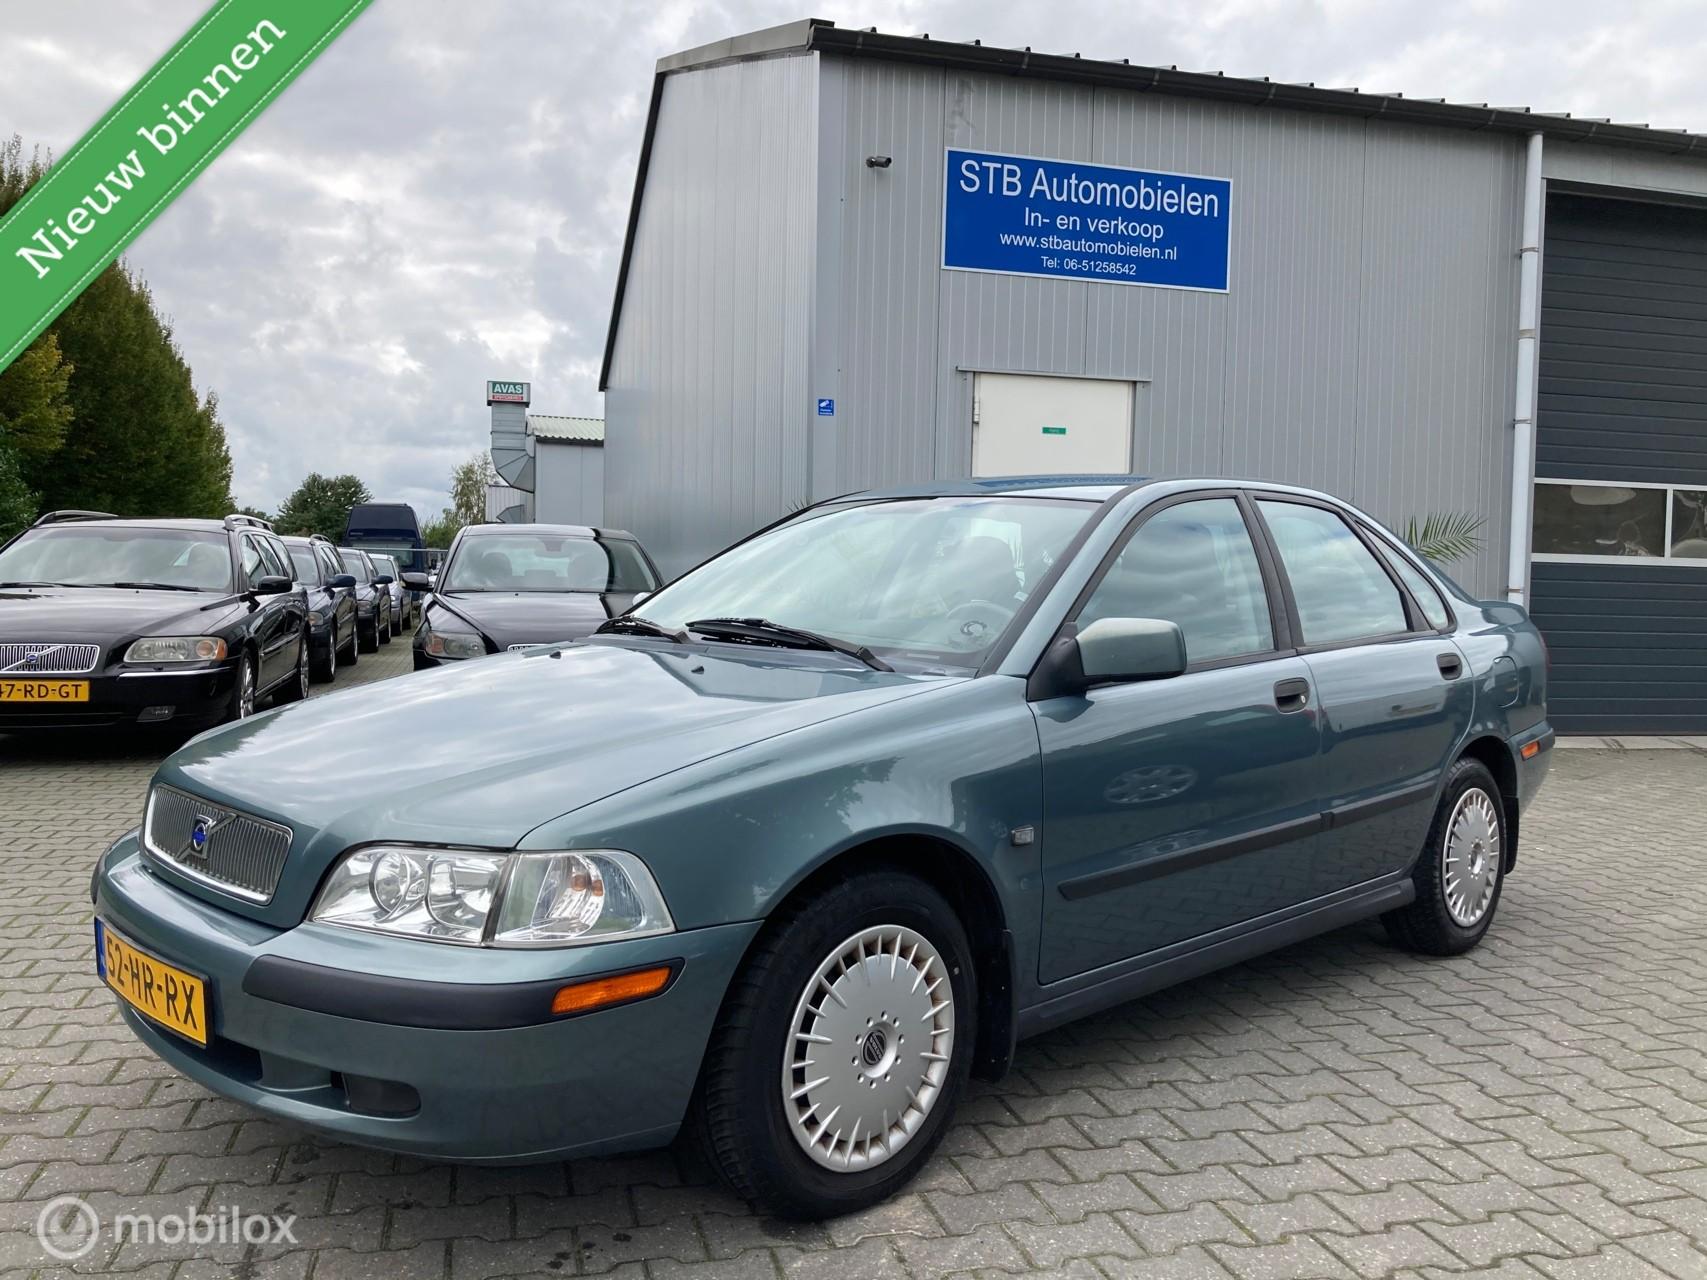 Volvo S40 1.8, Slechts 82.924 km's